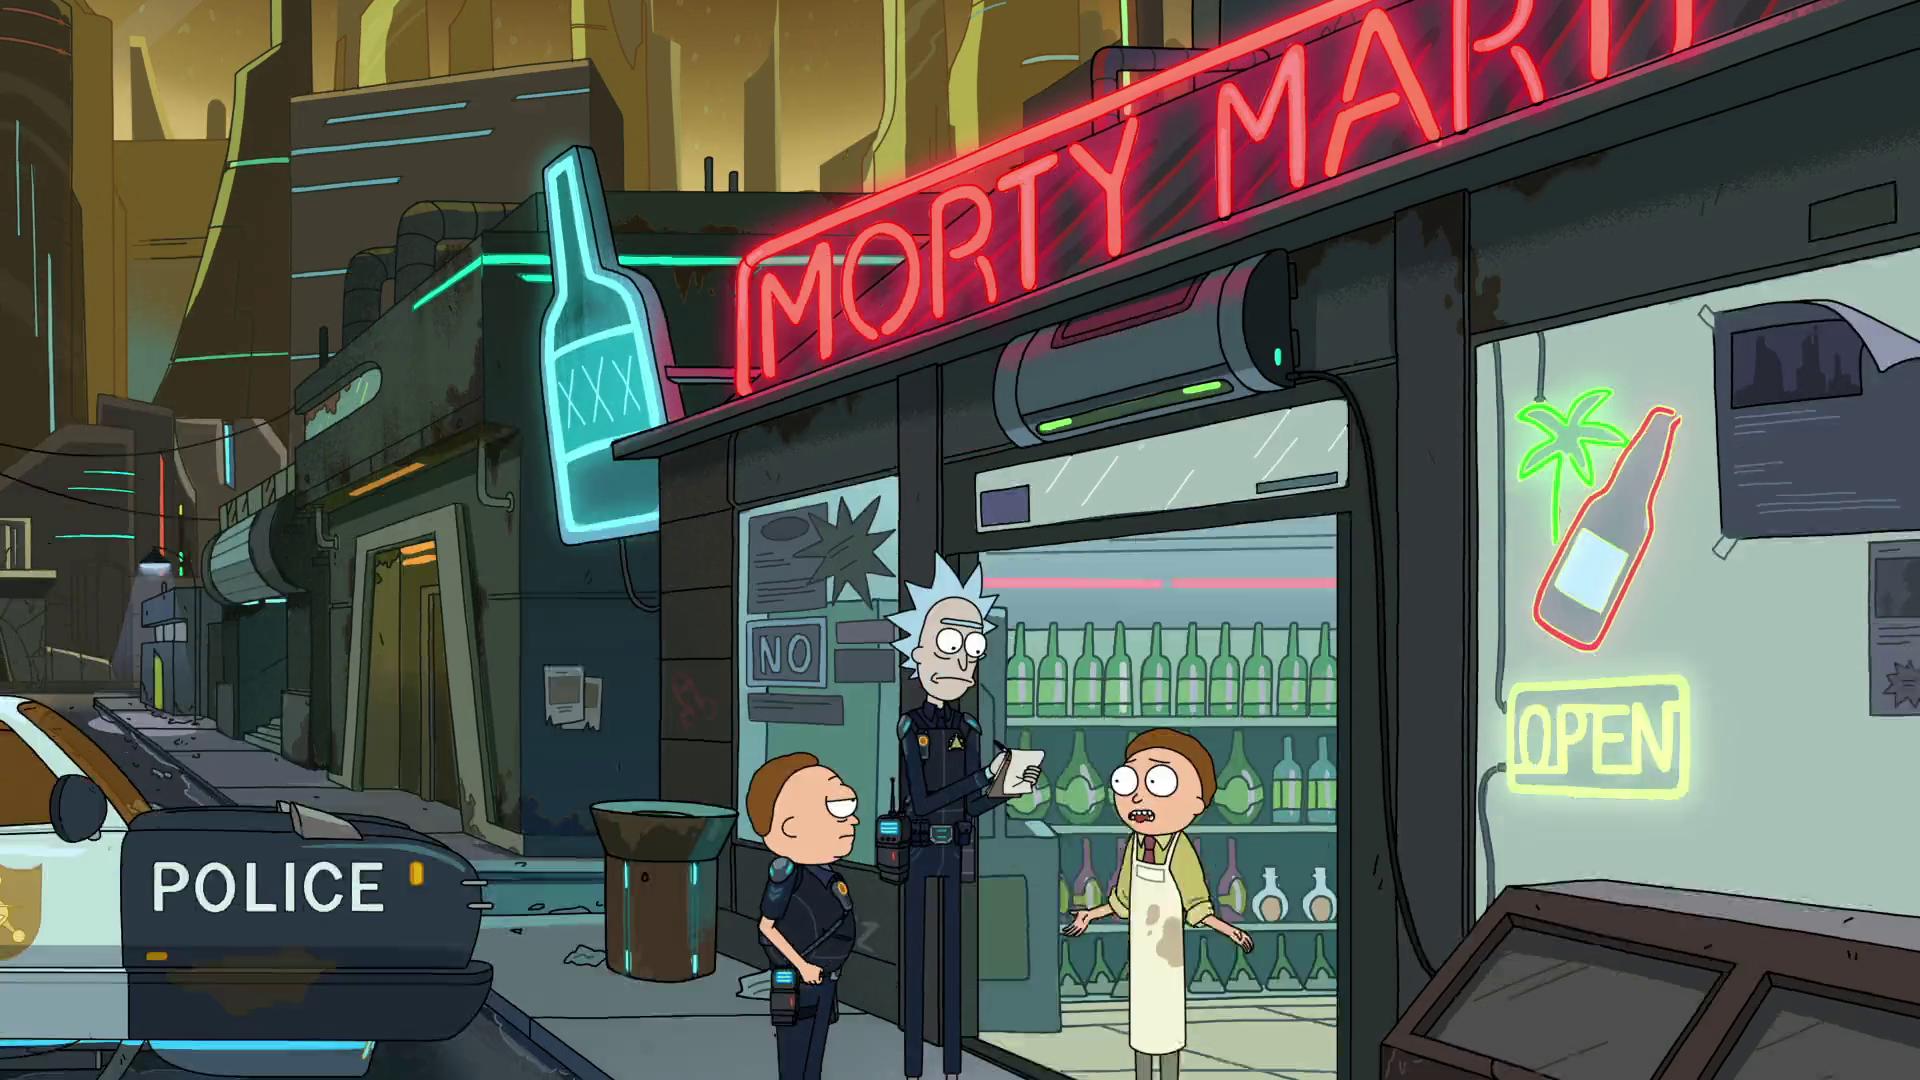 Morty Mart